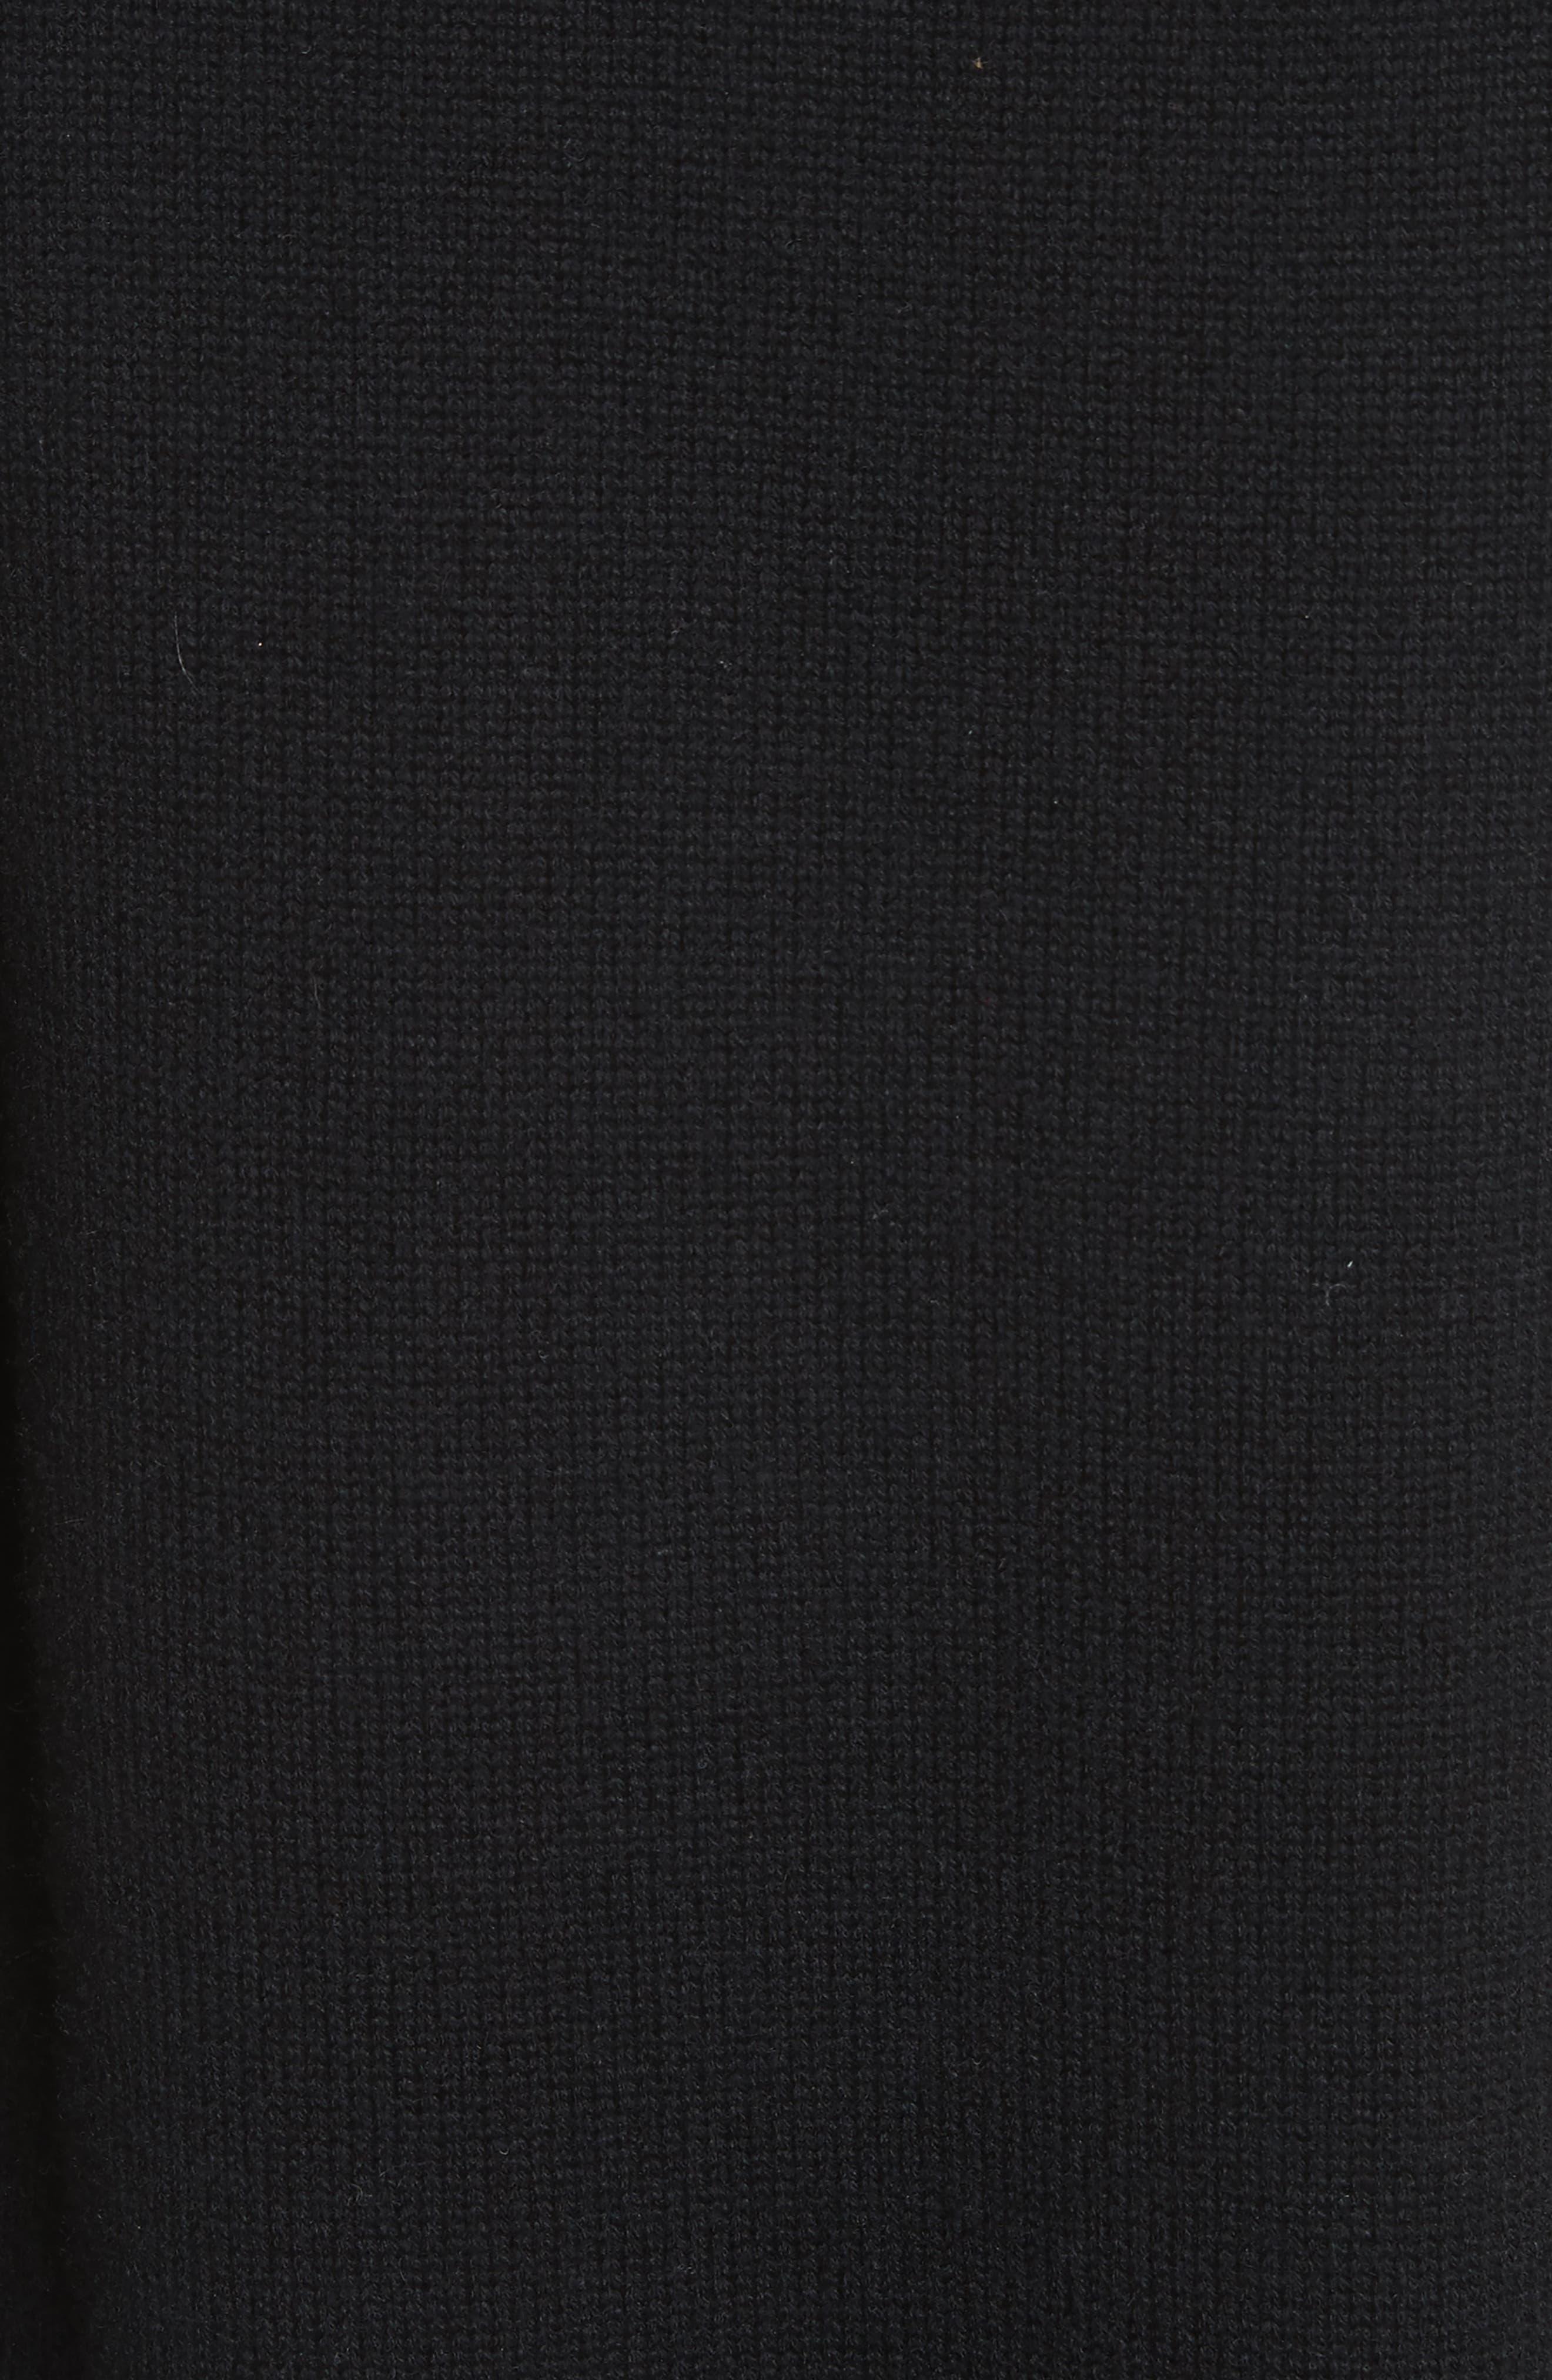 Ruffle Wool & Cashmere Sweater Dress,                             Alternate thumbnail 5, color,                             Black